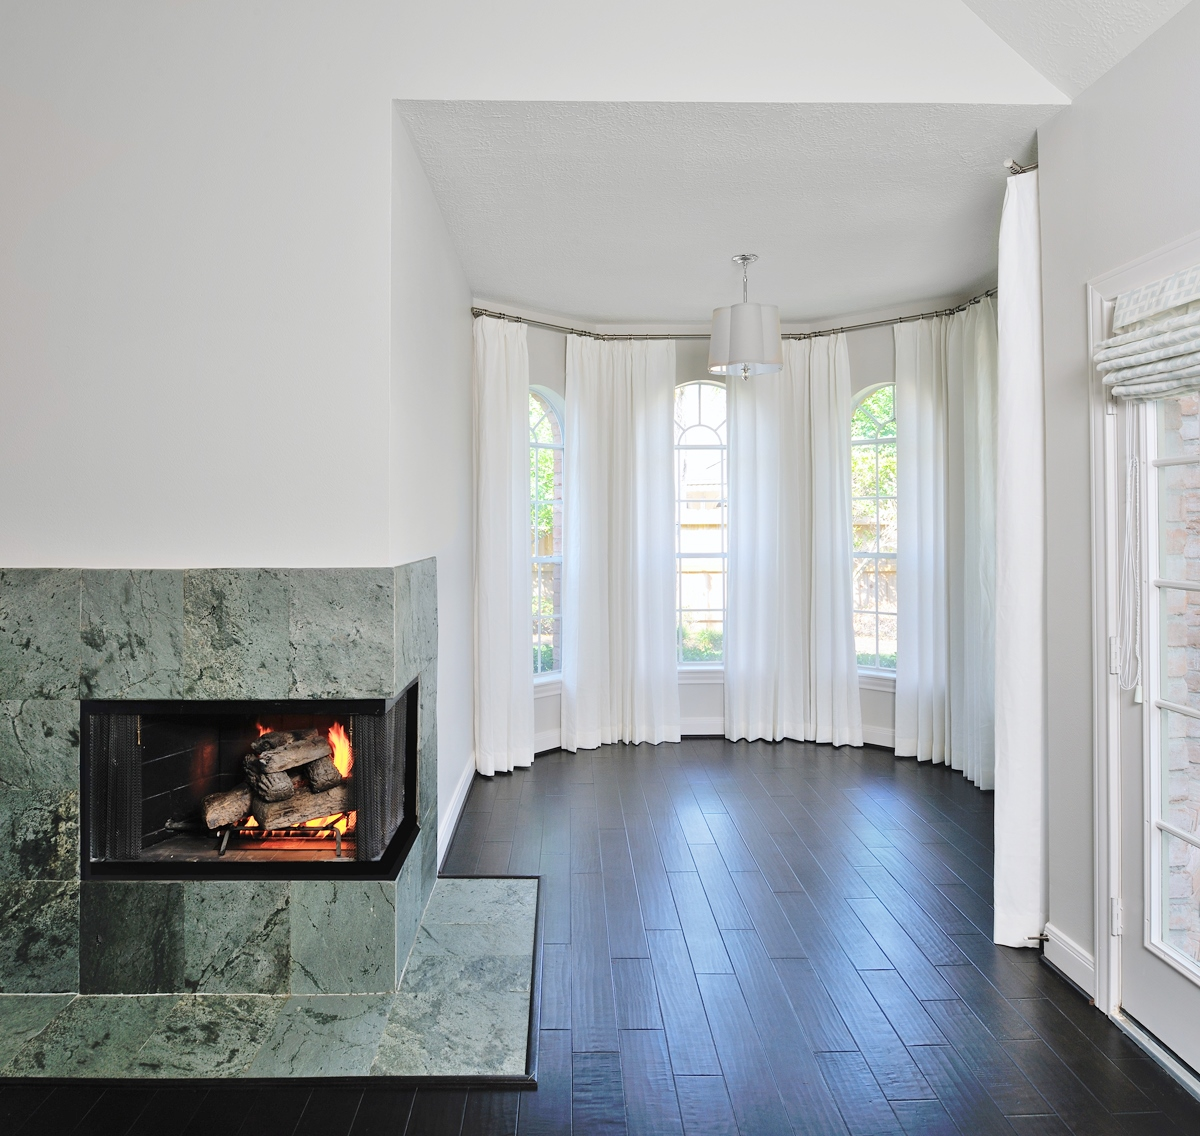 Traversing drapery panels minimized the look of these windows of different sizes in this bedroom alcove - Designer: Carla Aston, Photographer: Miro Dvorscak #windowtreatments #draperypanels #whitecurtains